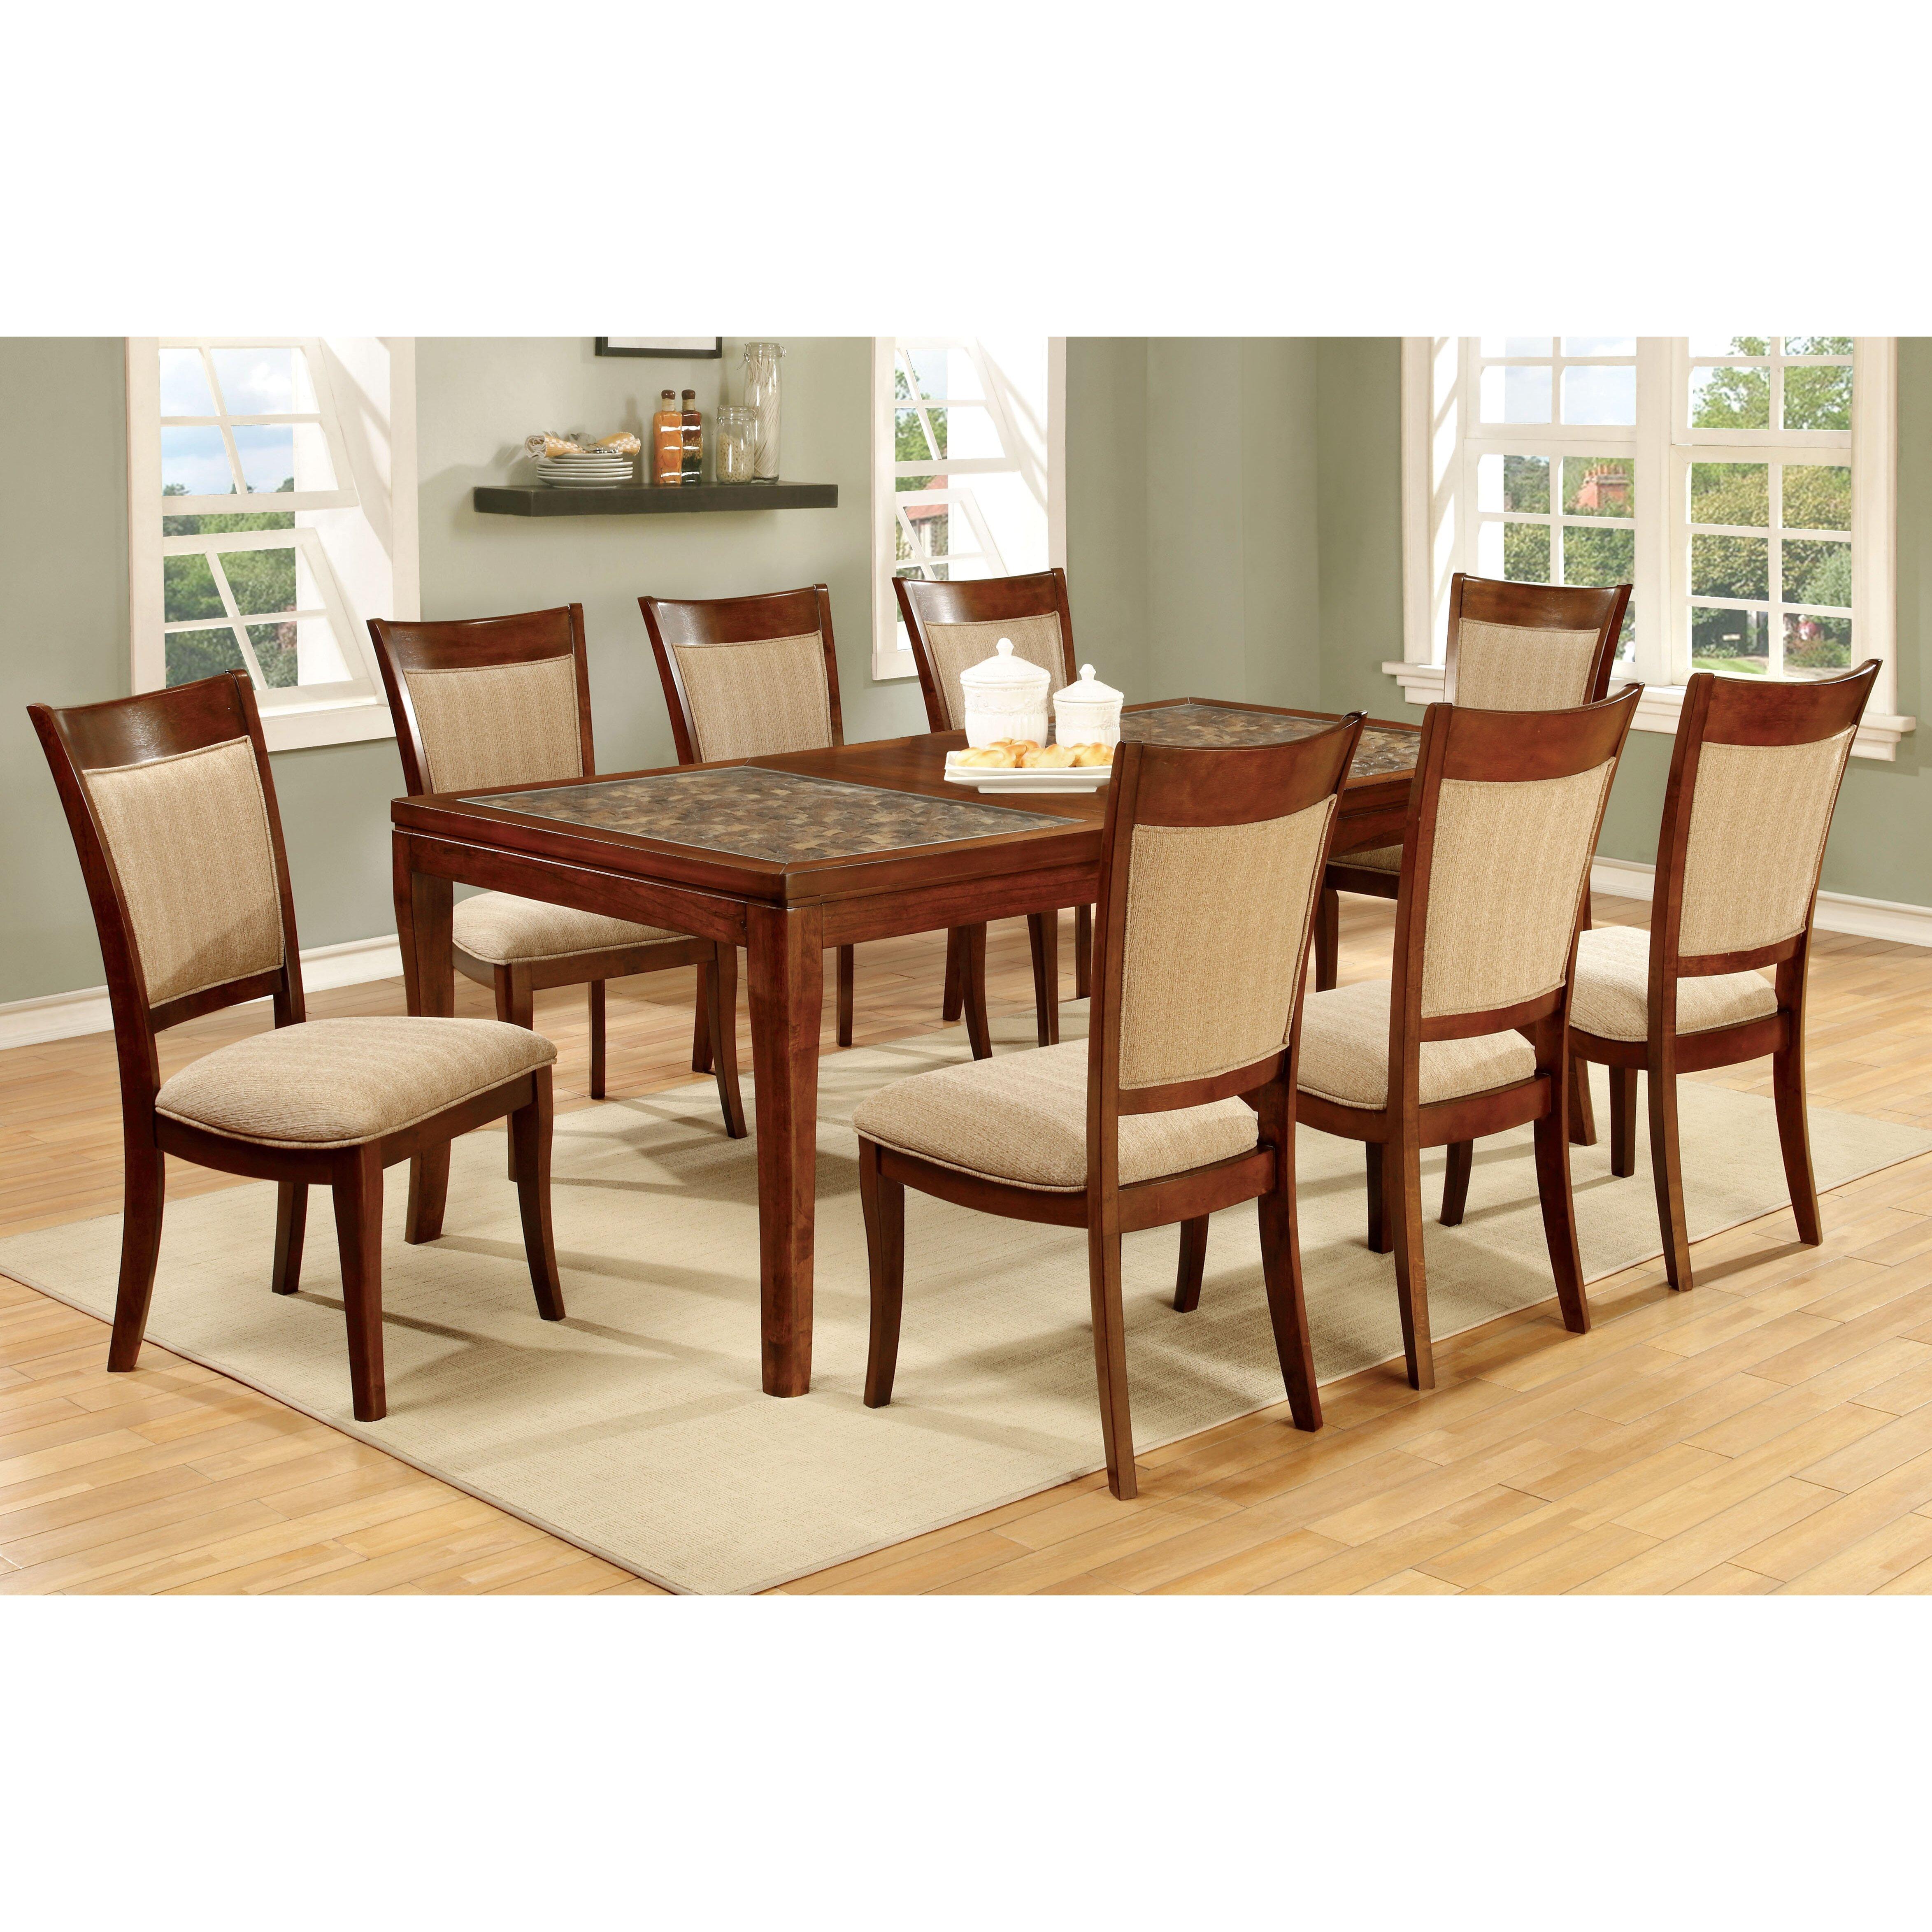 Hokku designs leto 9 piece dining set reviews wayfair for Hokku designs dining room furniture